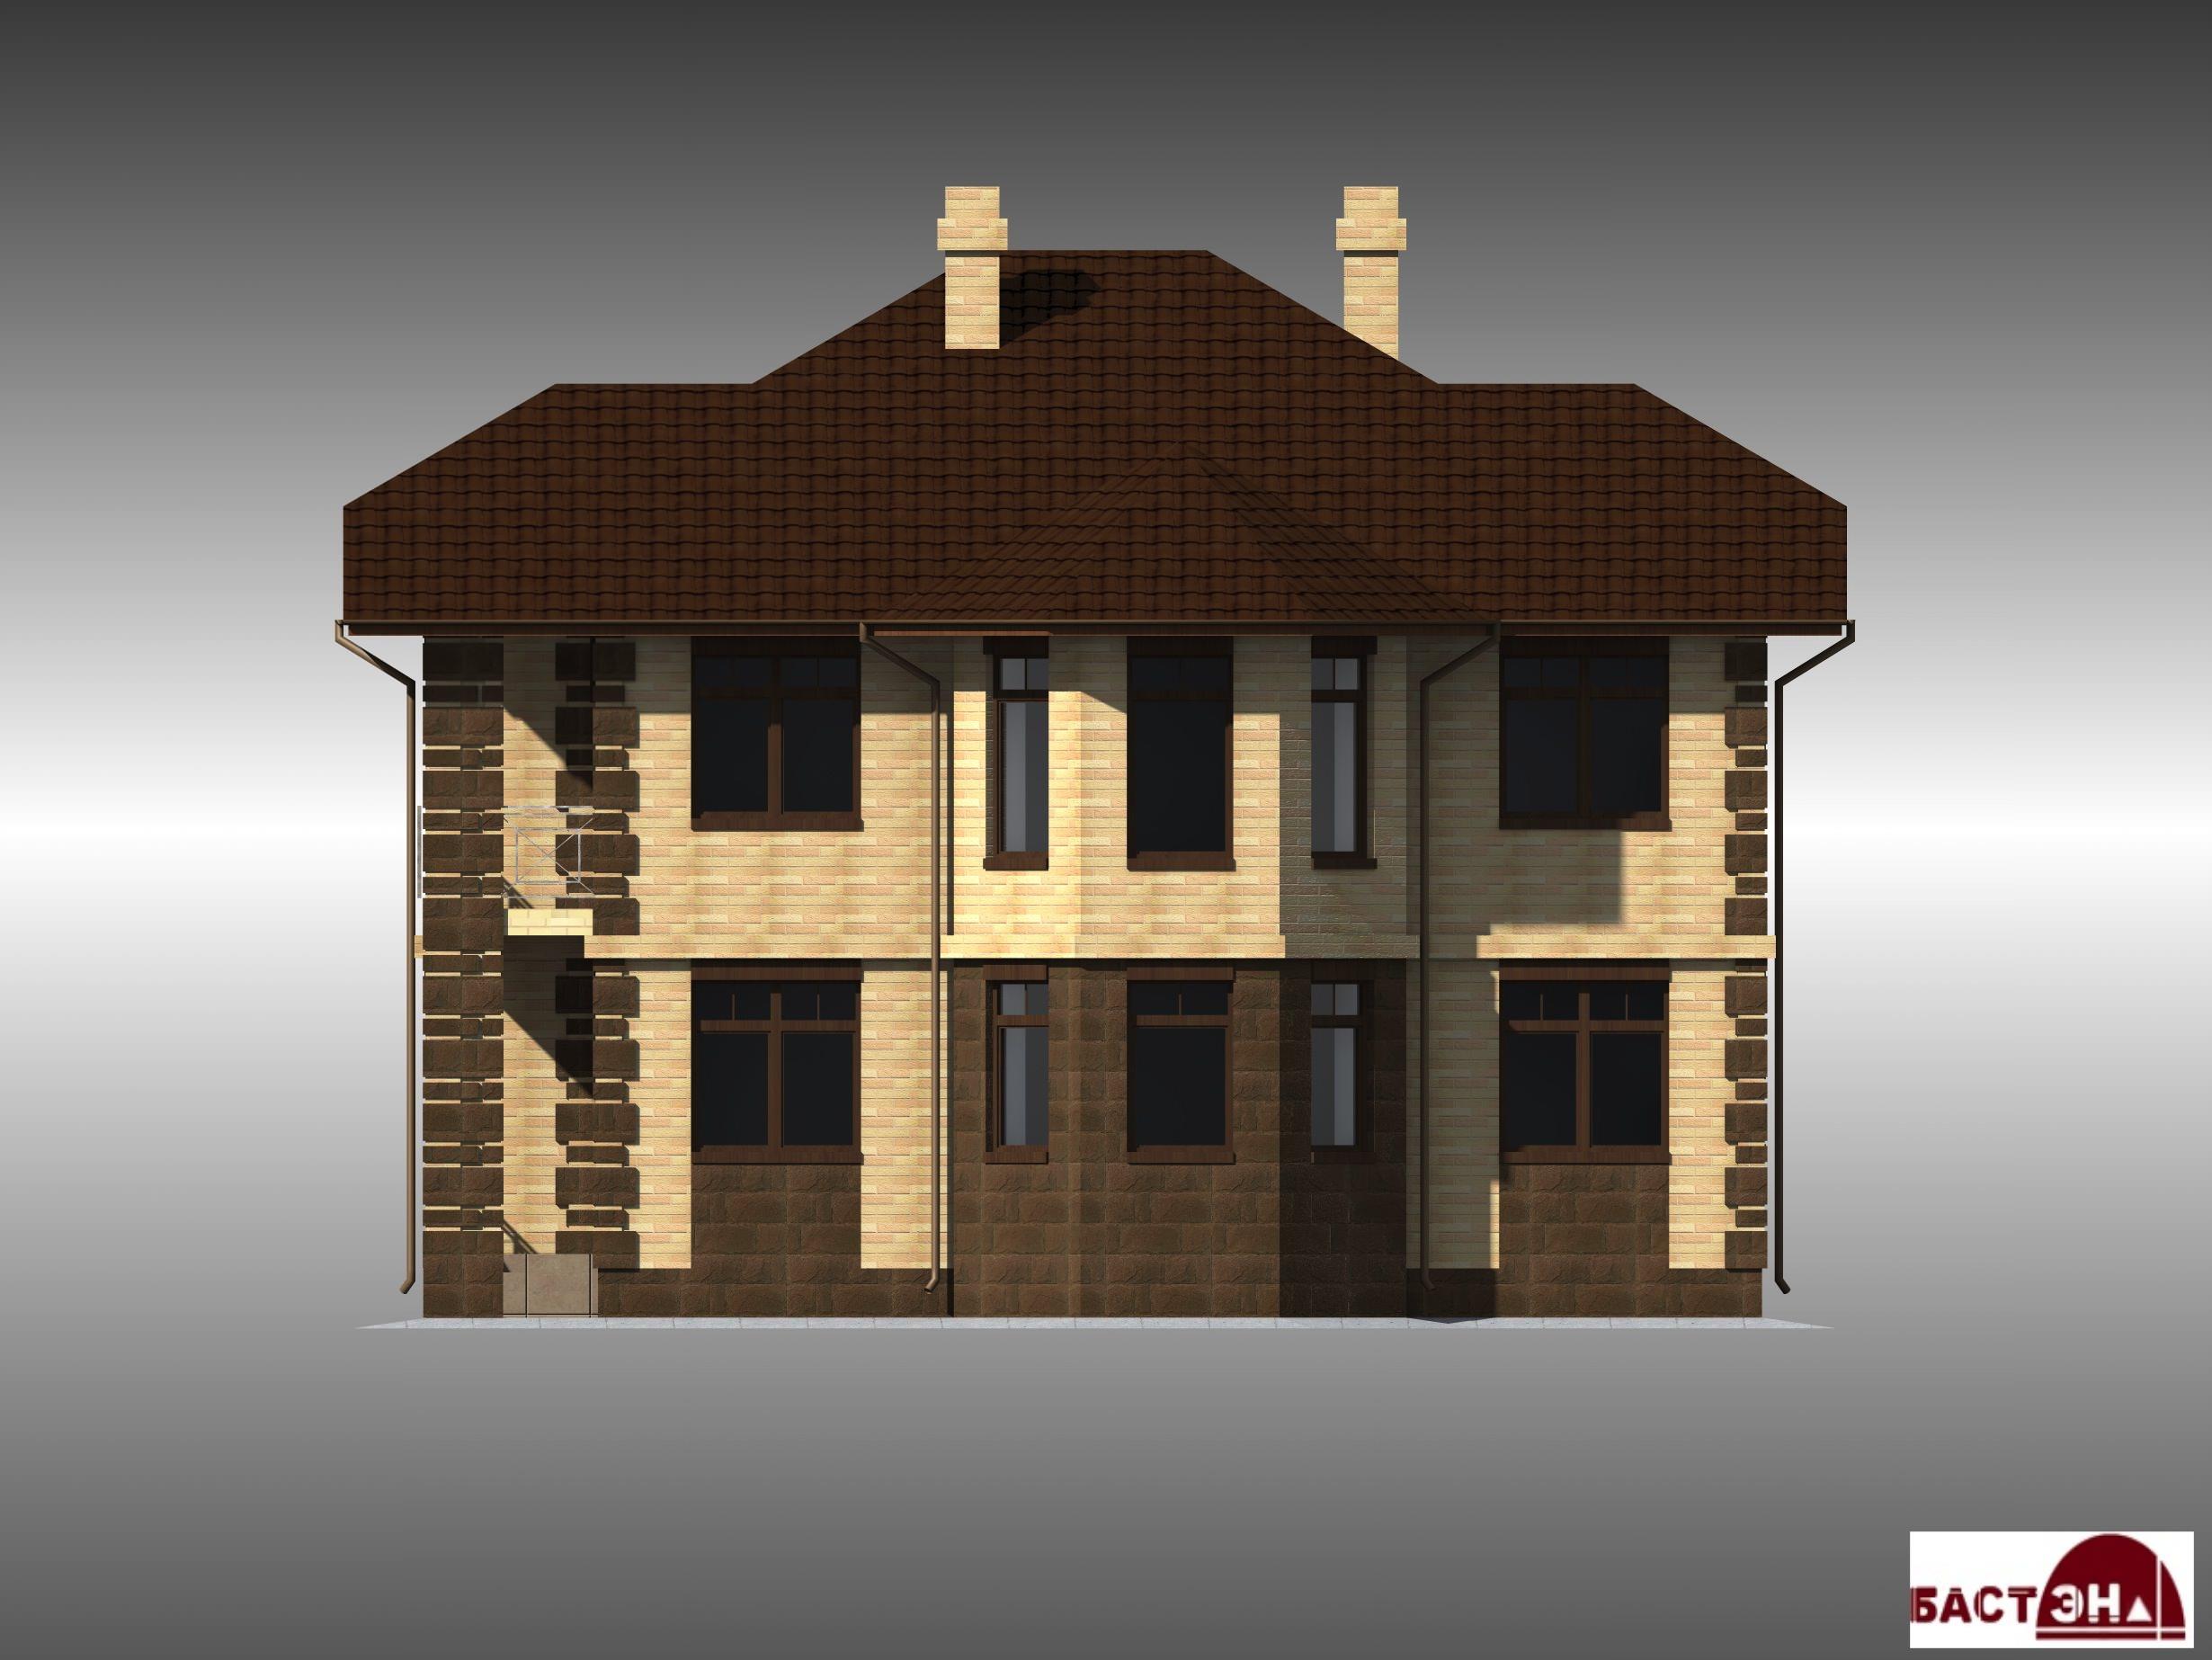 vid-3-individualnyj-dizajn-fasada-tipovogo-proekta-53-31.jpg